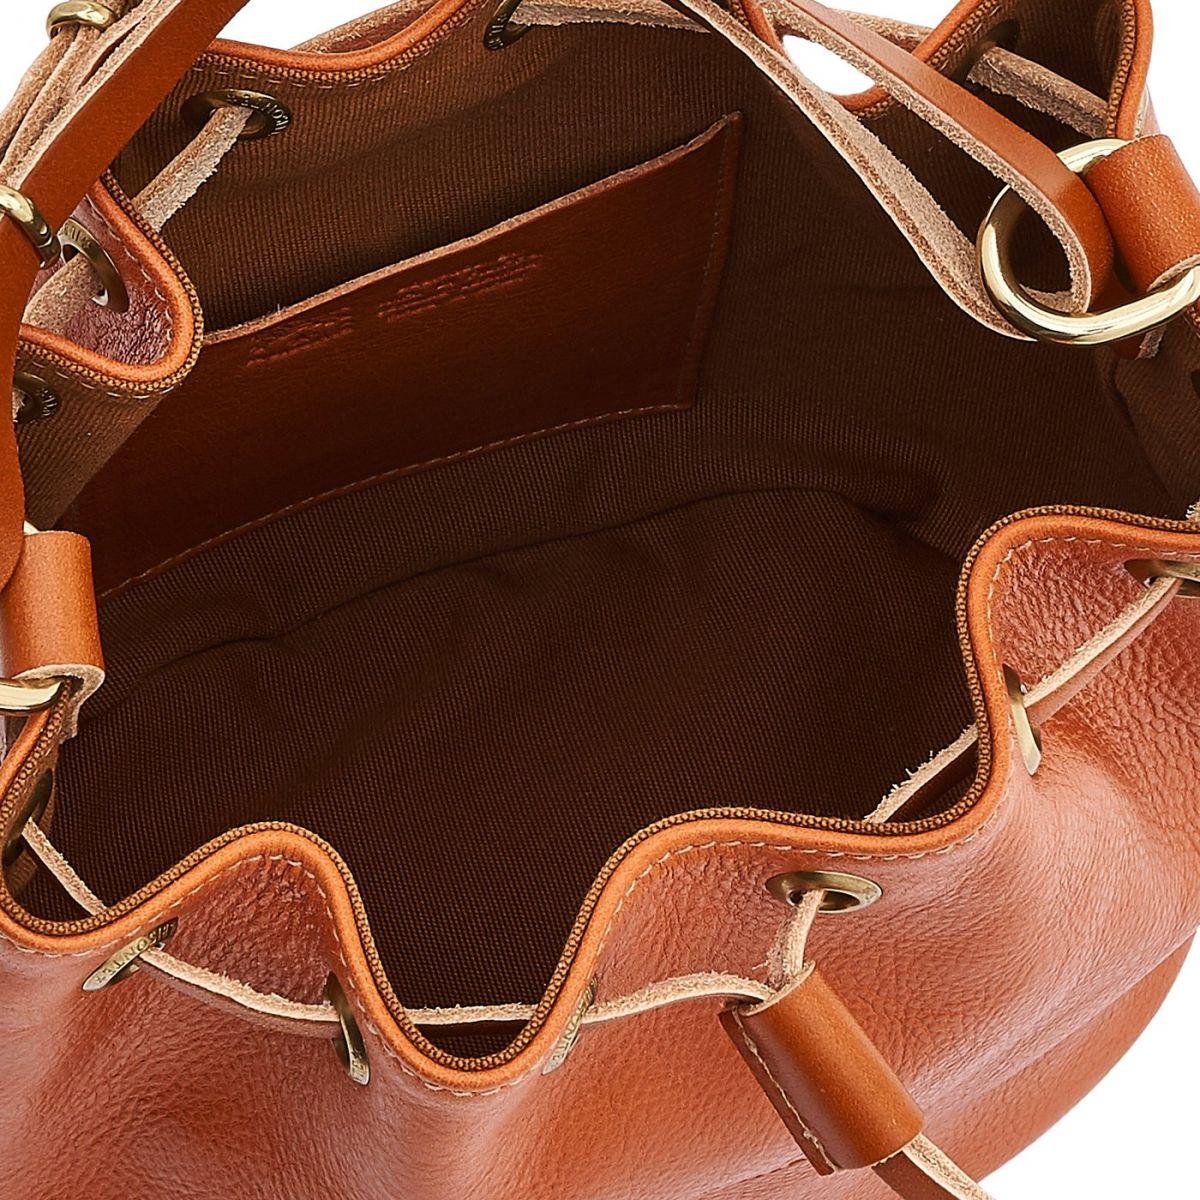 Women's Bucket Bag in Cowhide Double Leather BBU001 color Caramel | Details